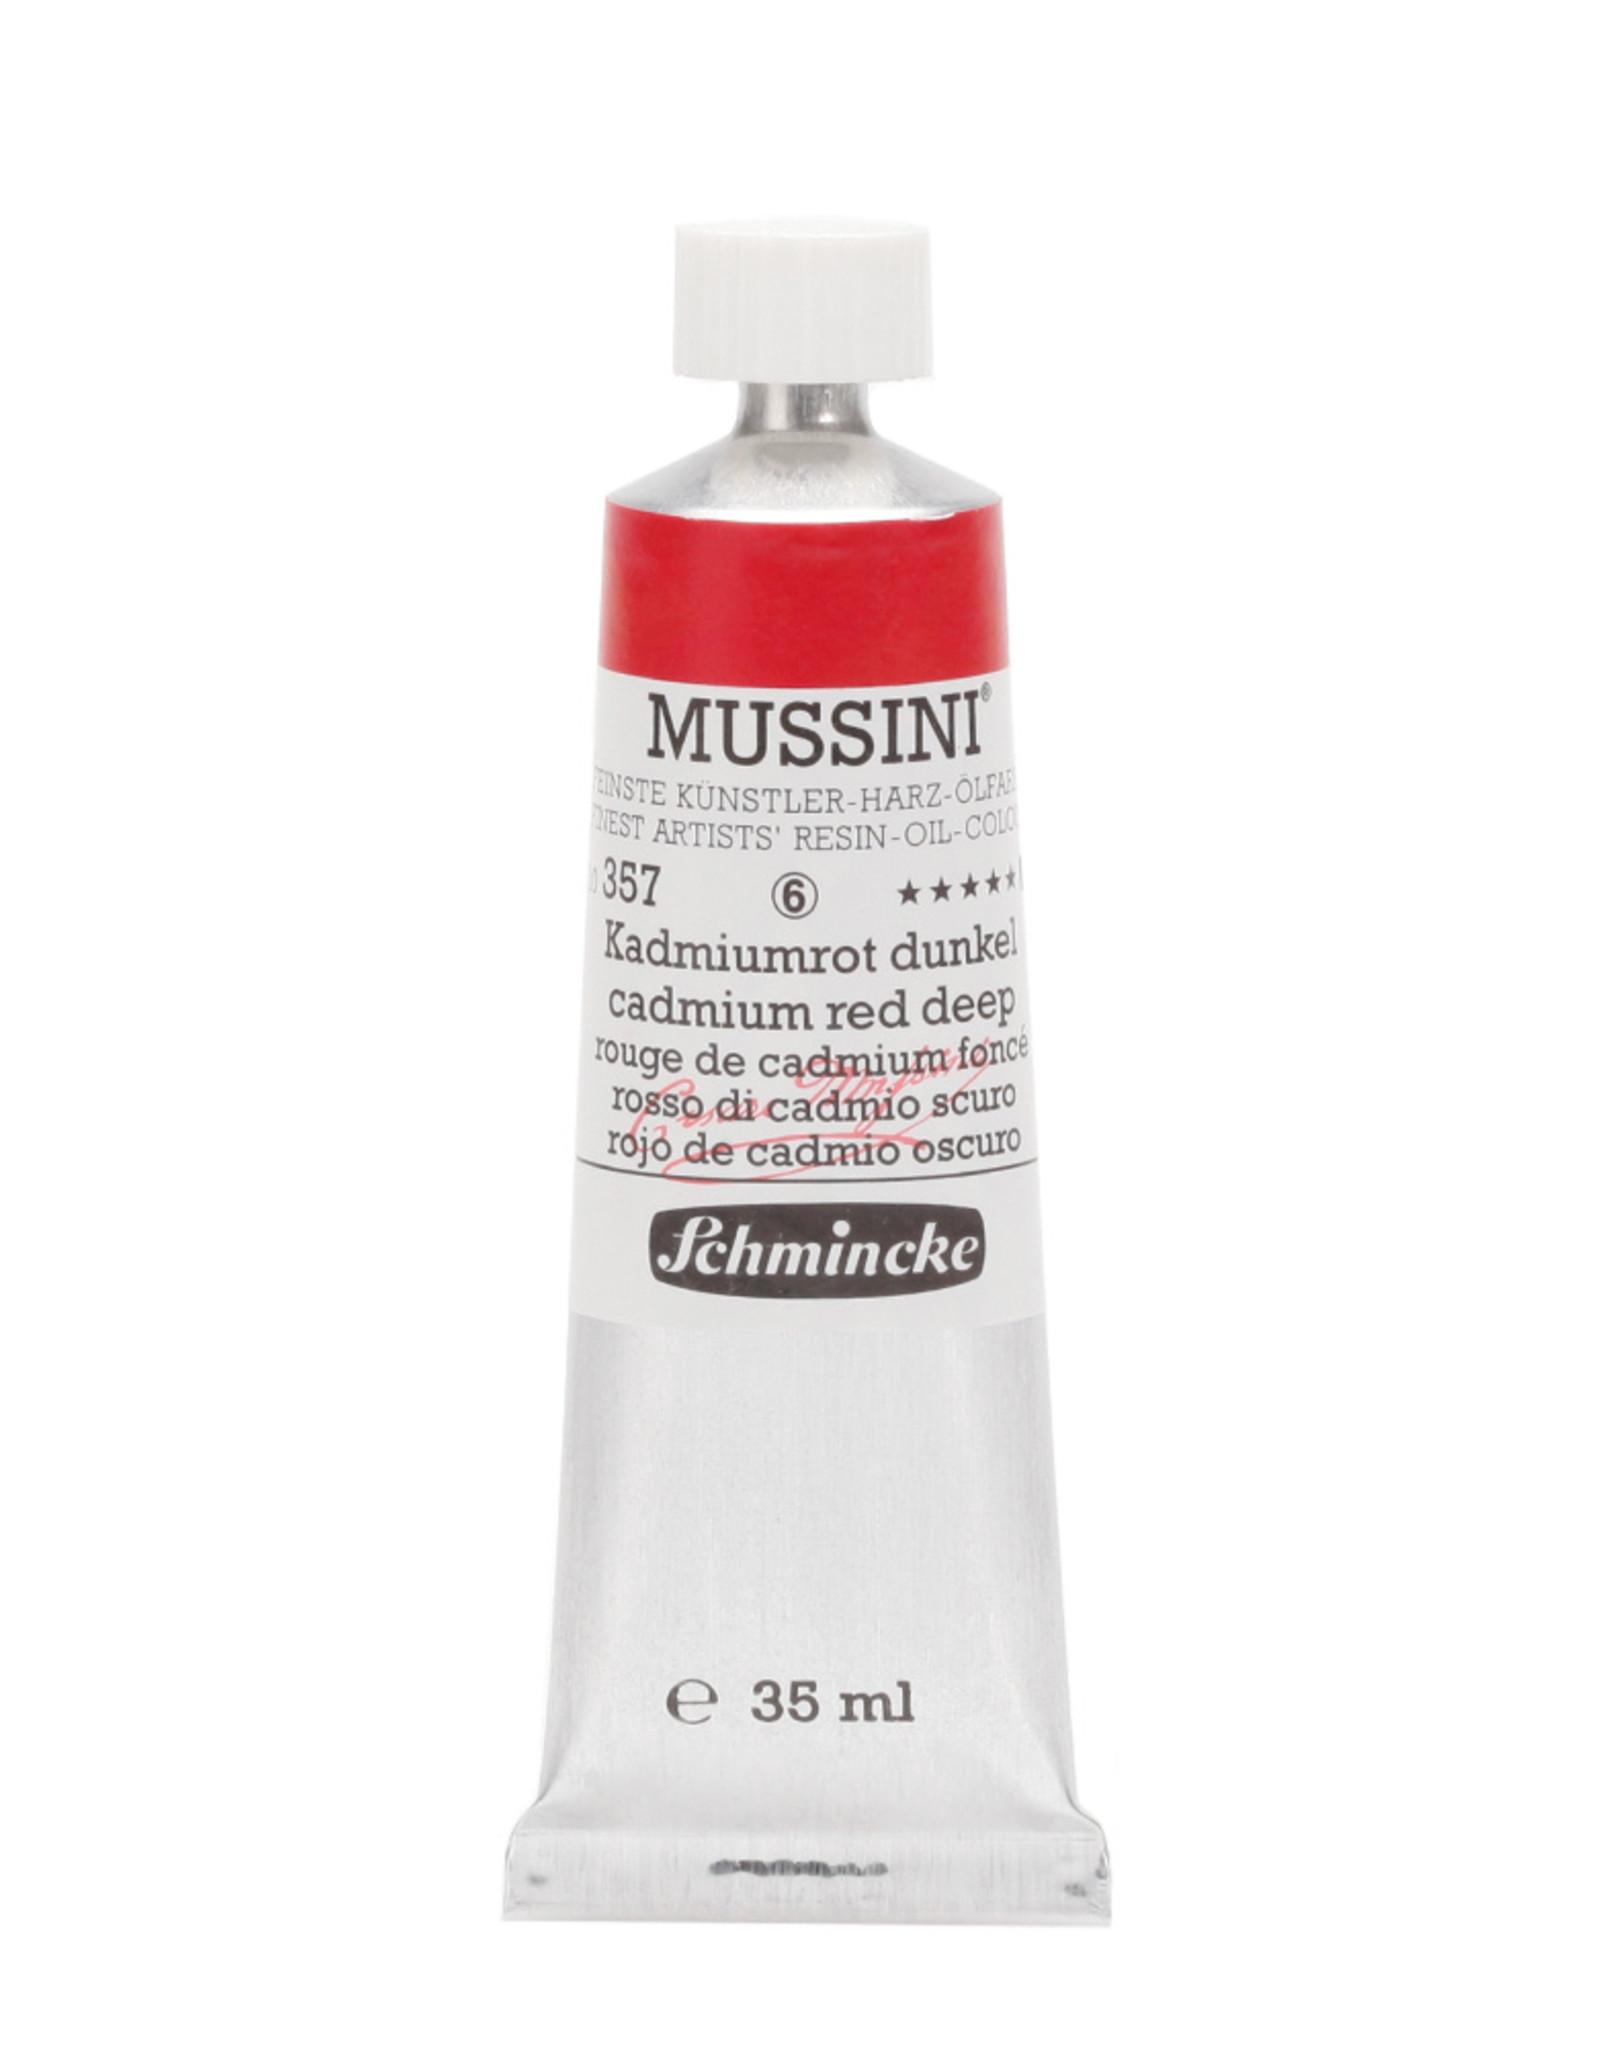 Schmincke Olieverf Mussini 35 ml Rood Cadmium Donker 357/6